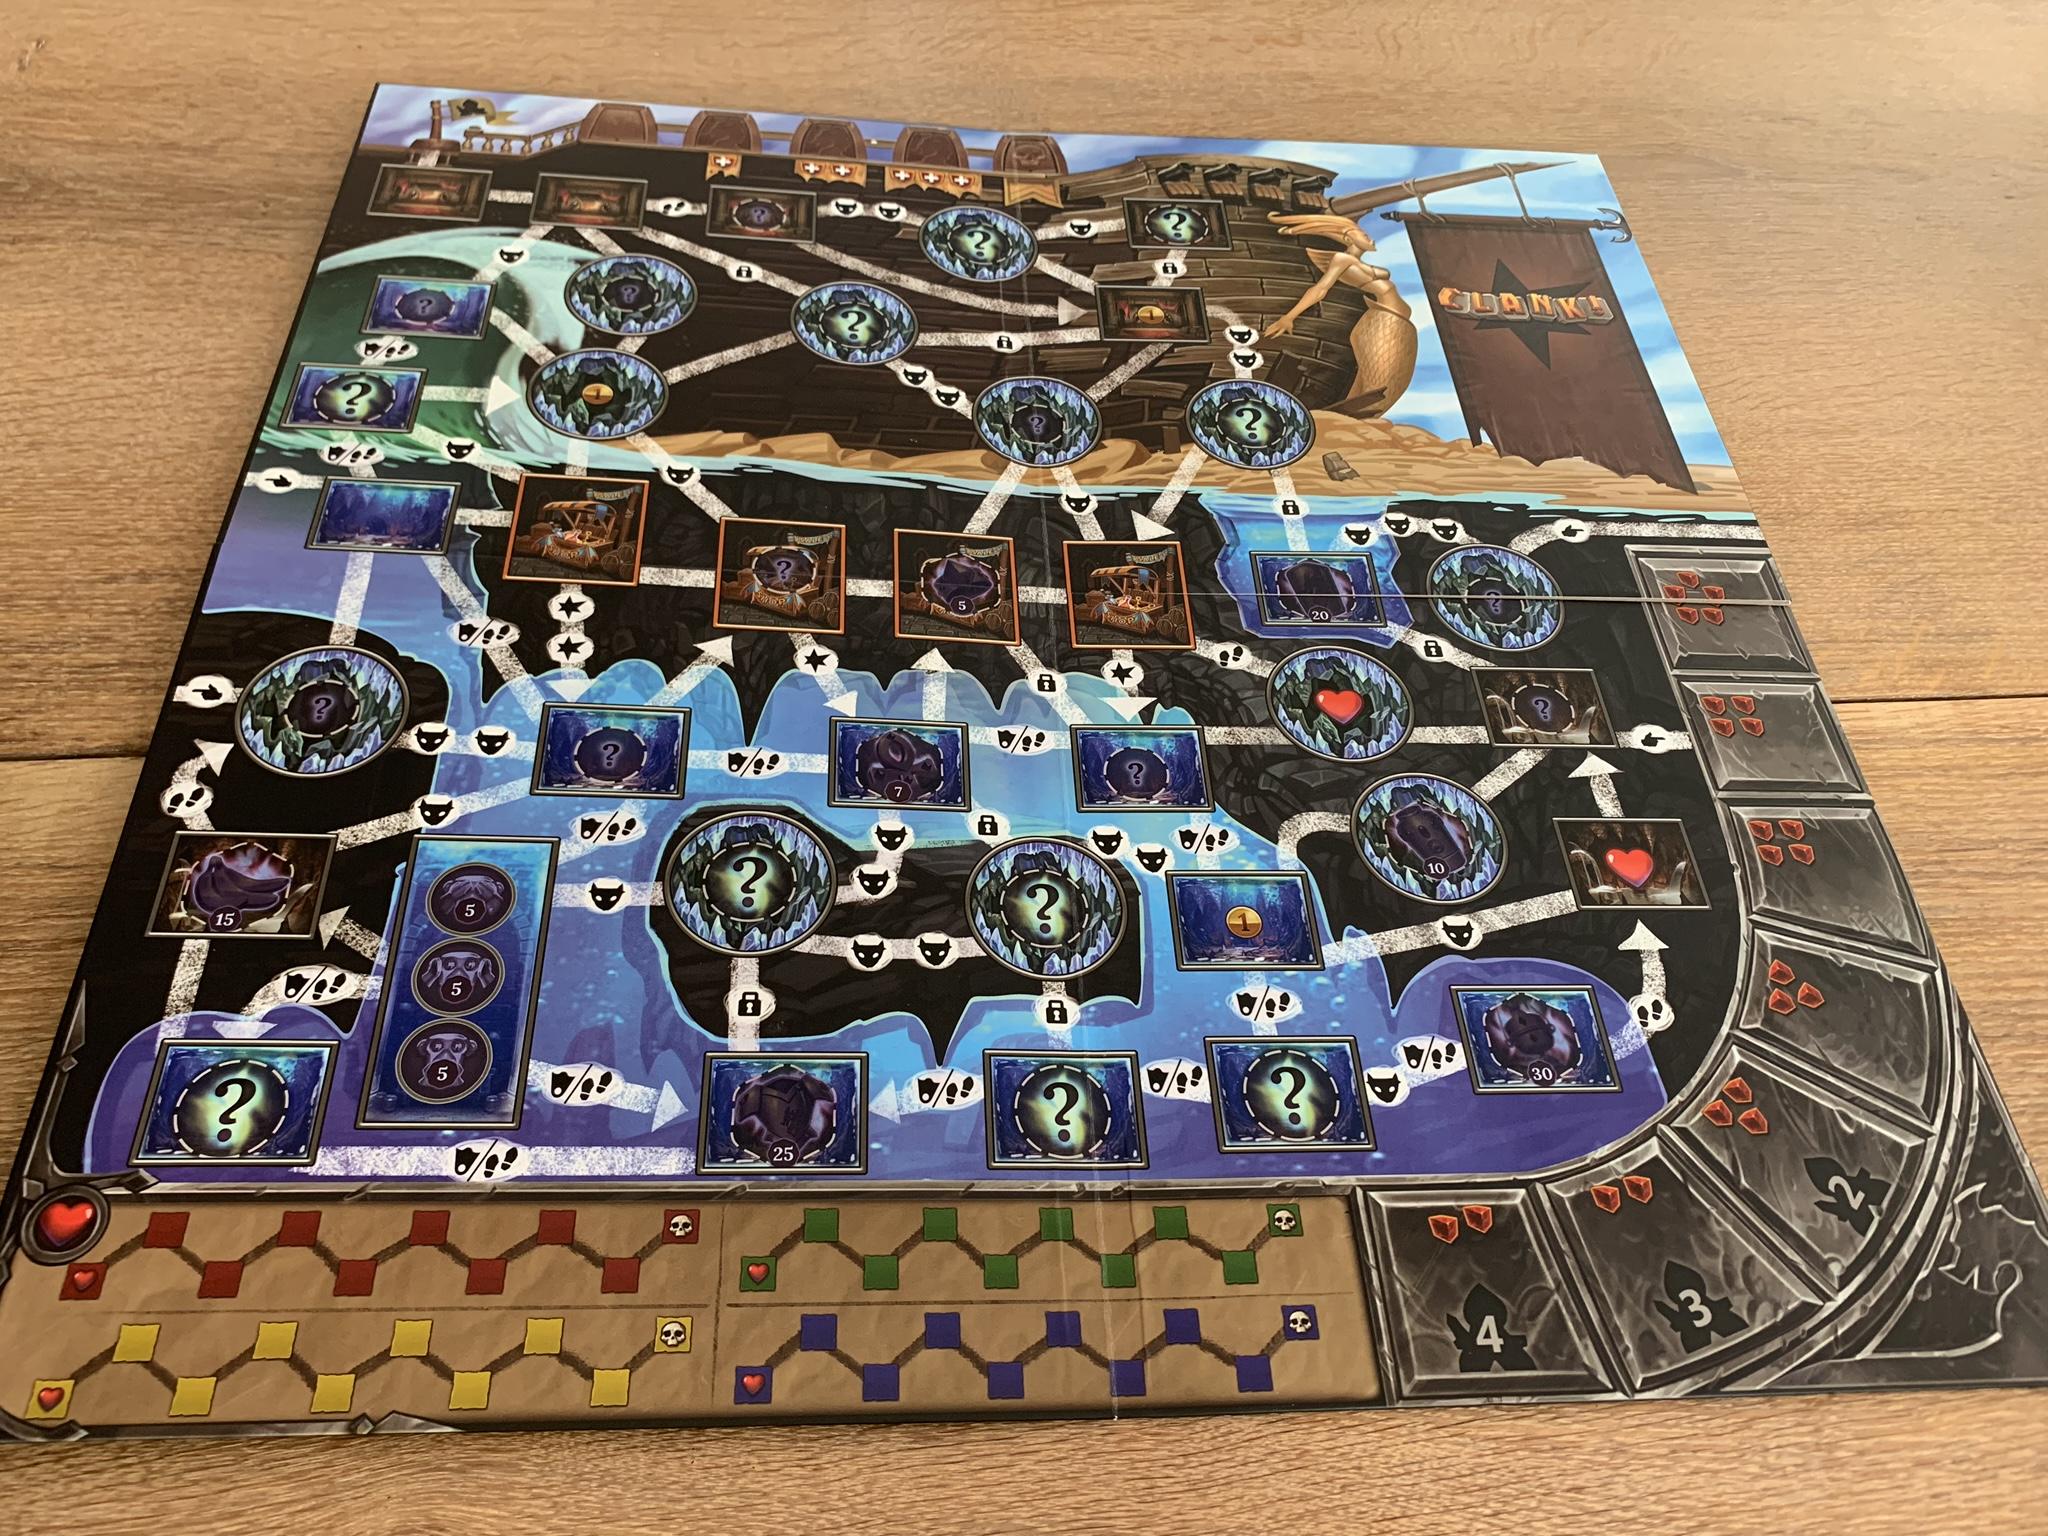 Clank!: Sunken Treasures - game board 1 side